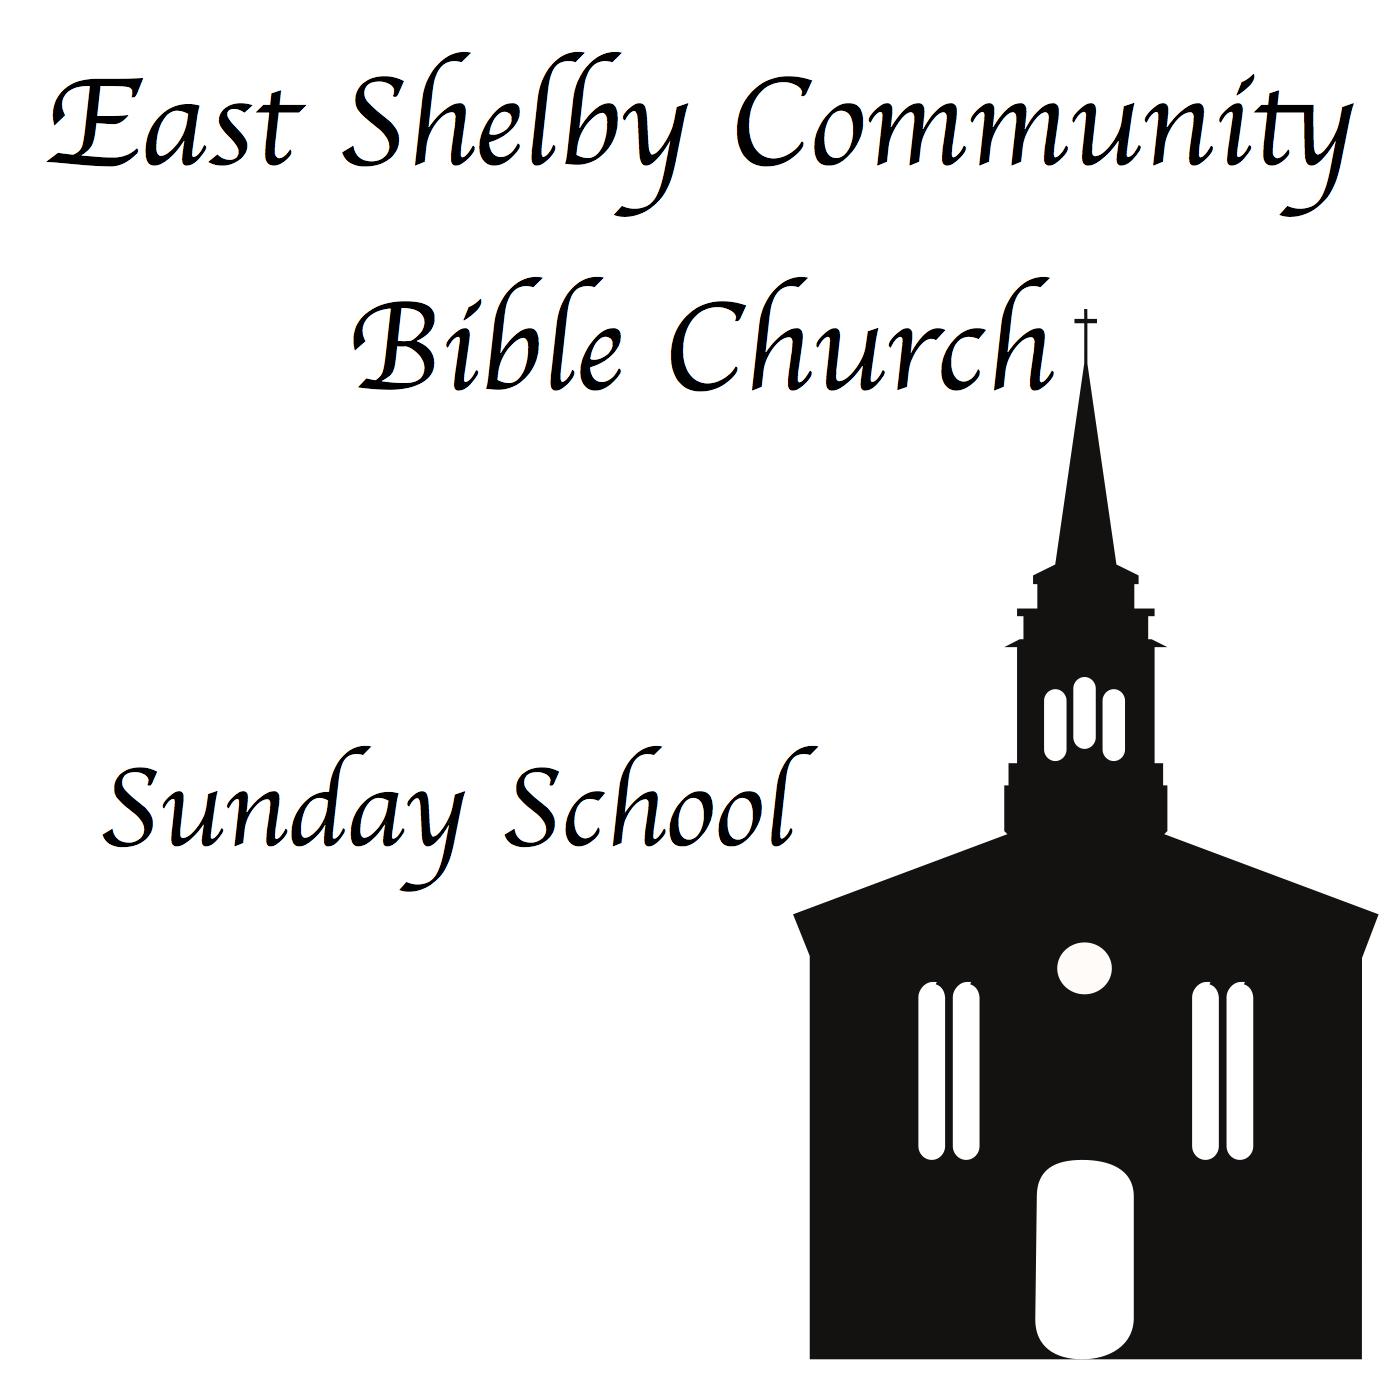 Sunday School - East Shelby Community Bible Church